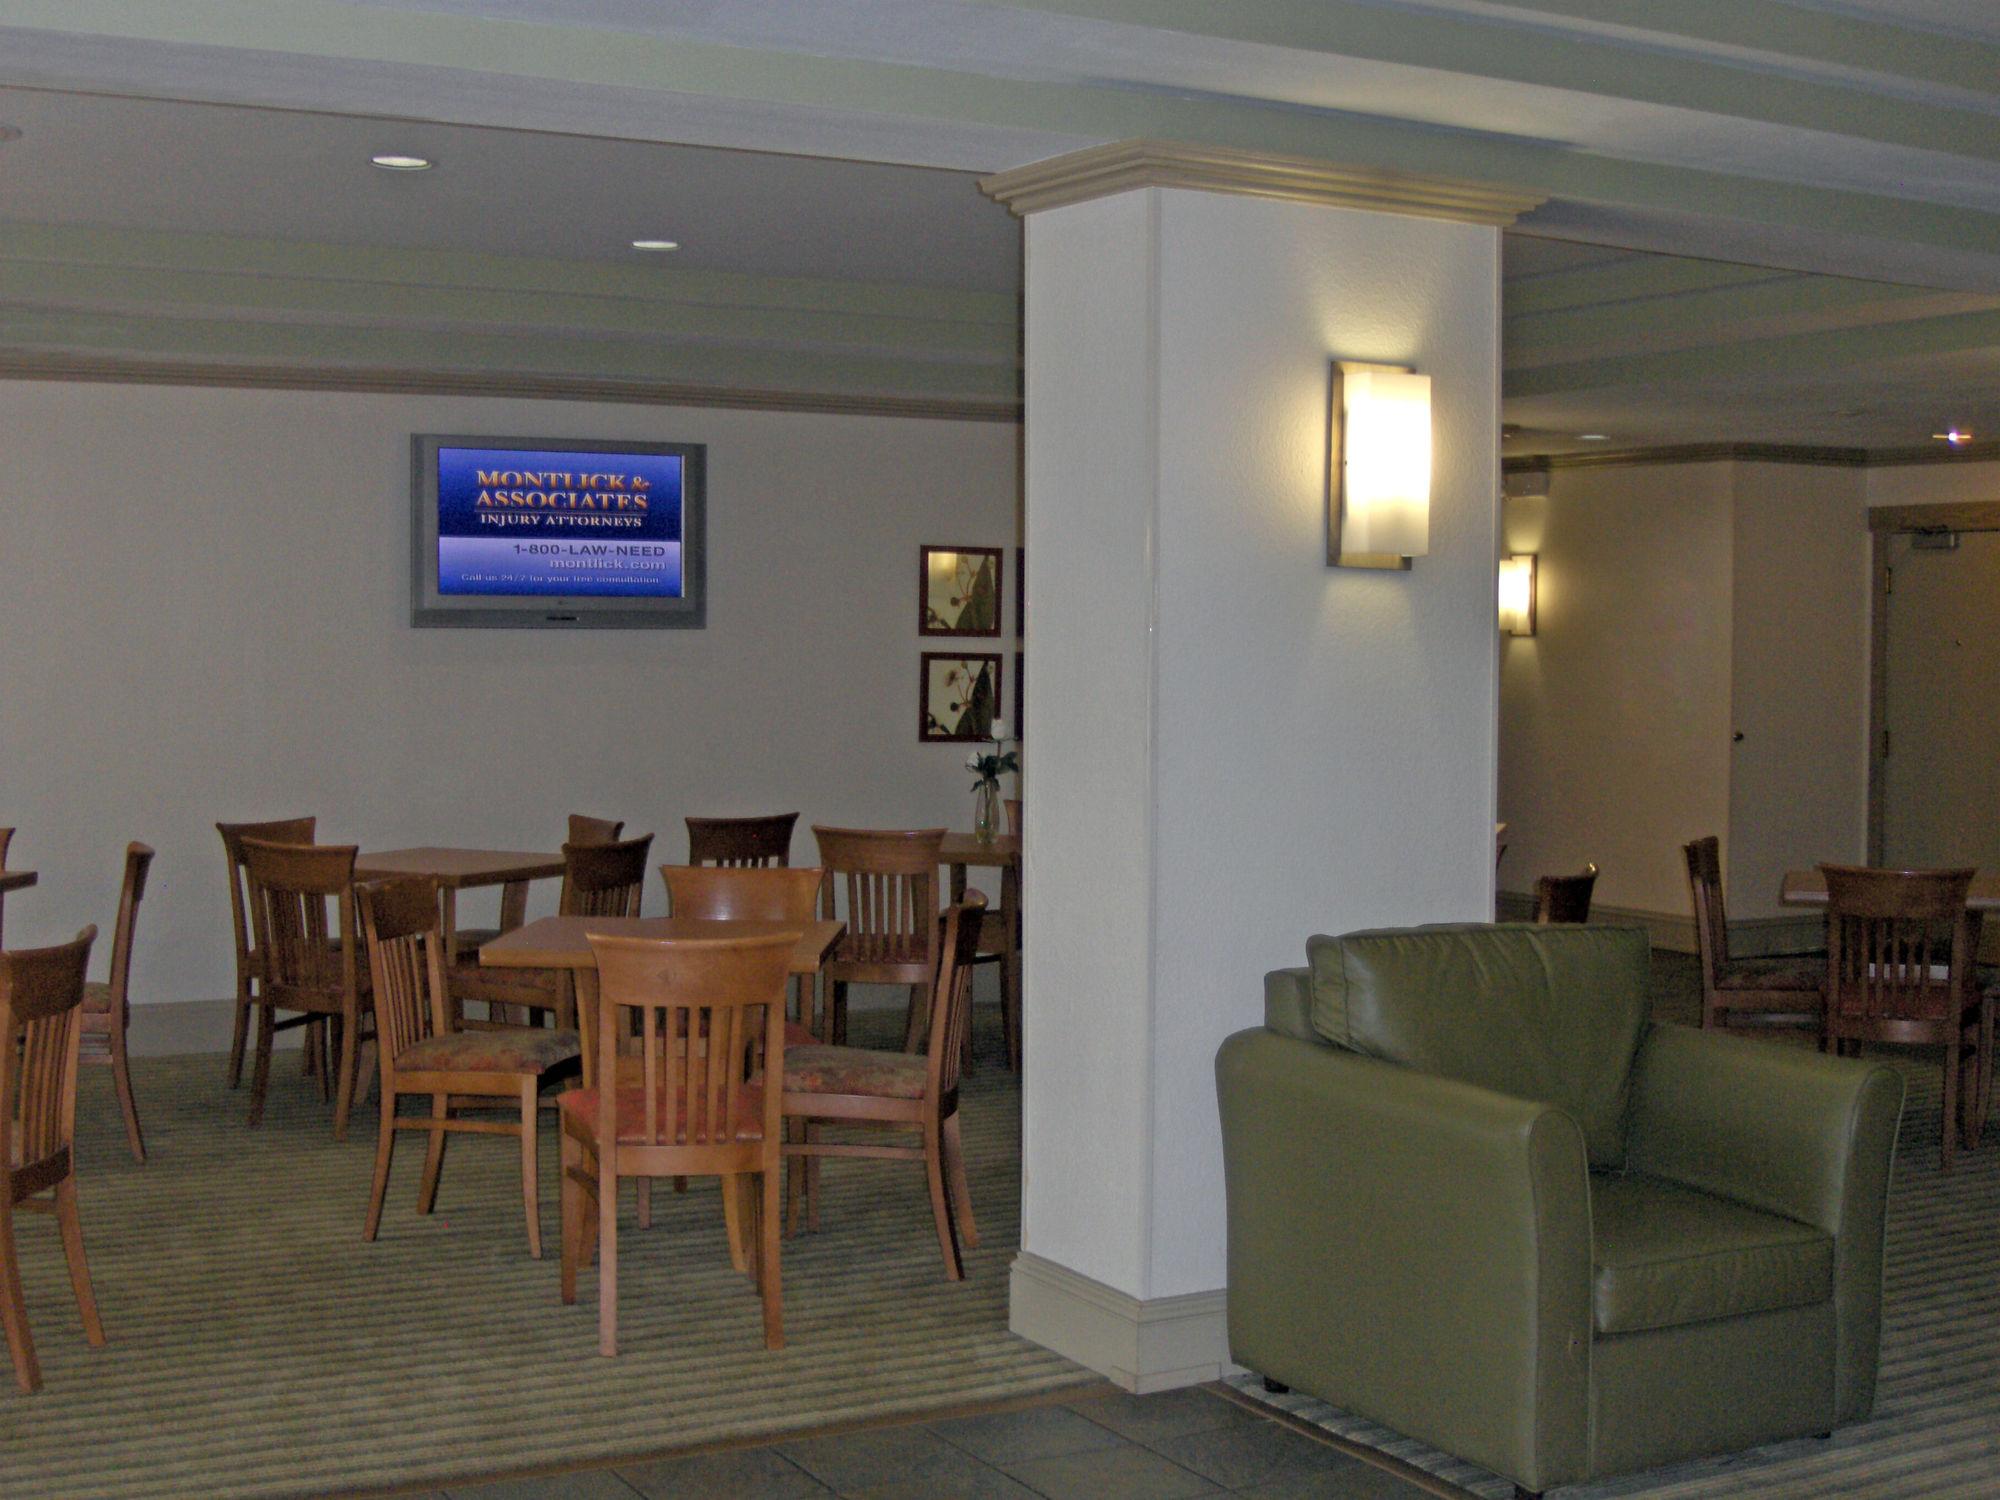 Extended Stay America - Atlanta - Gwinnett Place in Duluth, GA